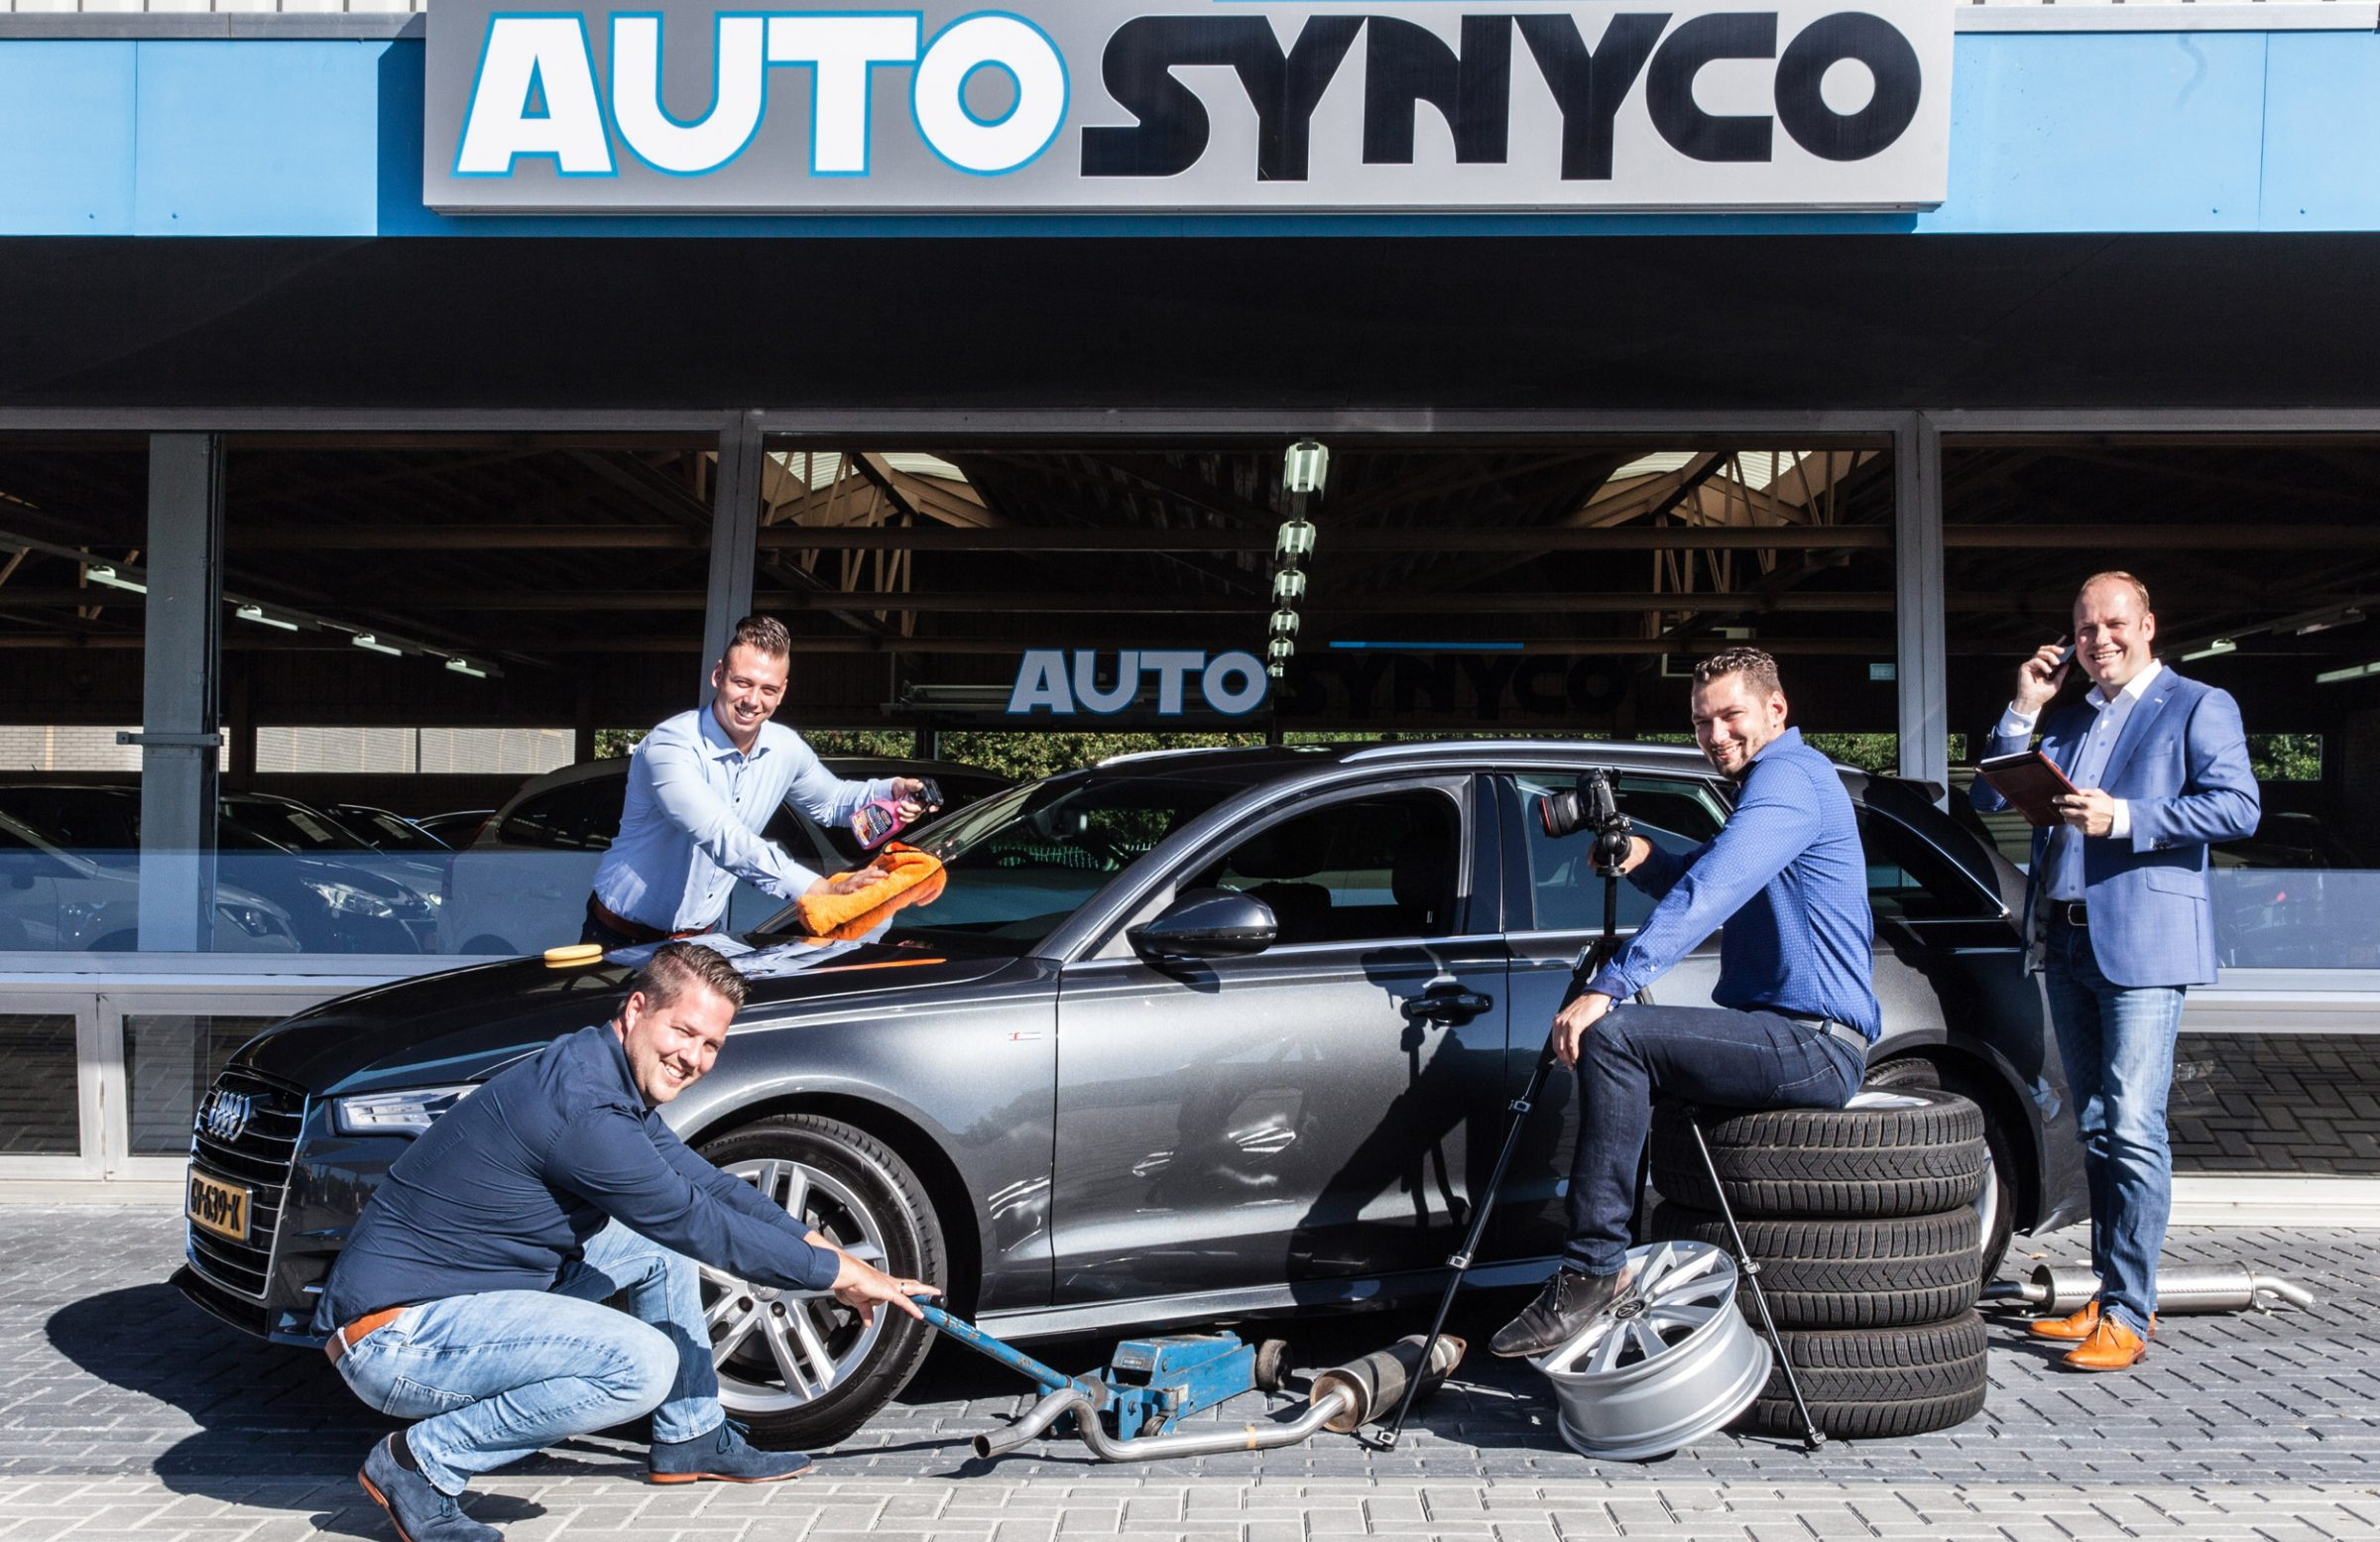 Auto Synyco - afspraak maken